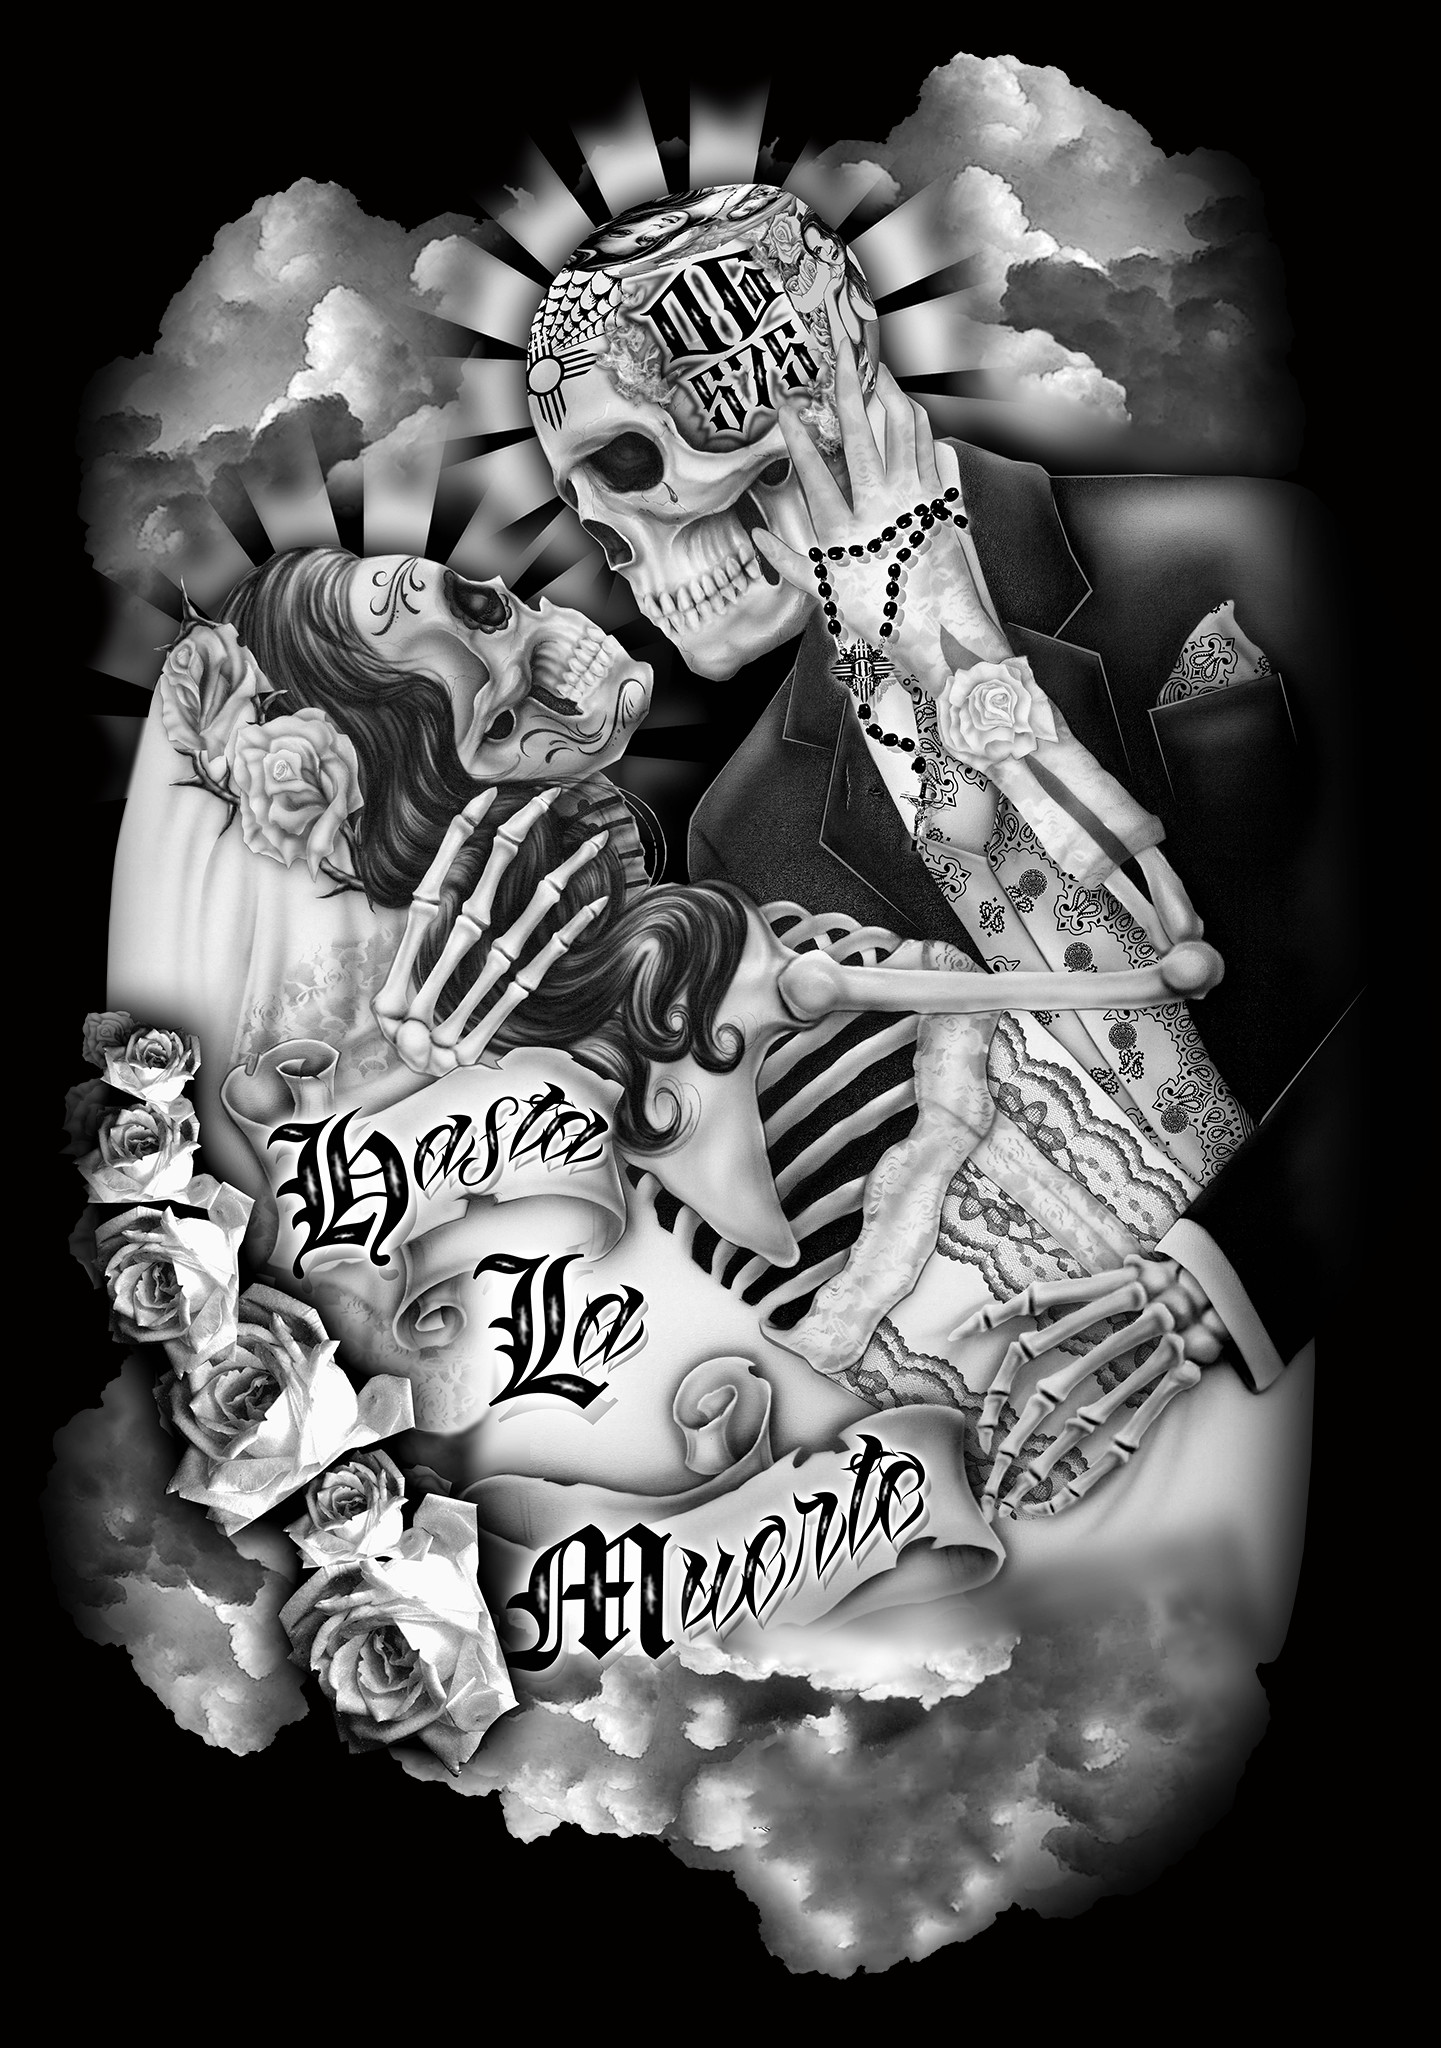 Free download Lowrider Arte Wallpaper